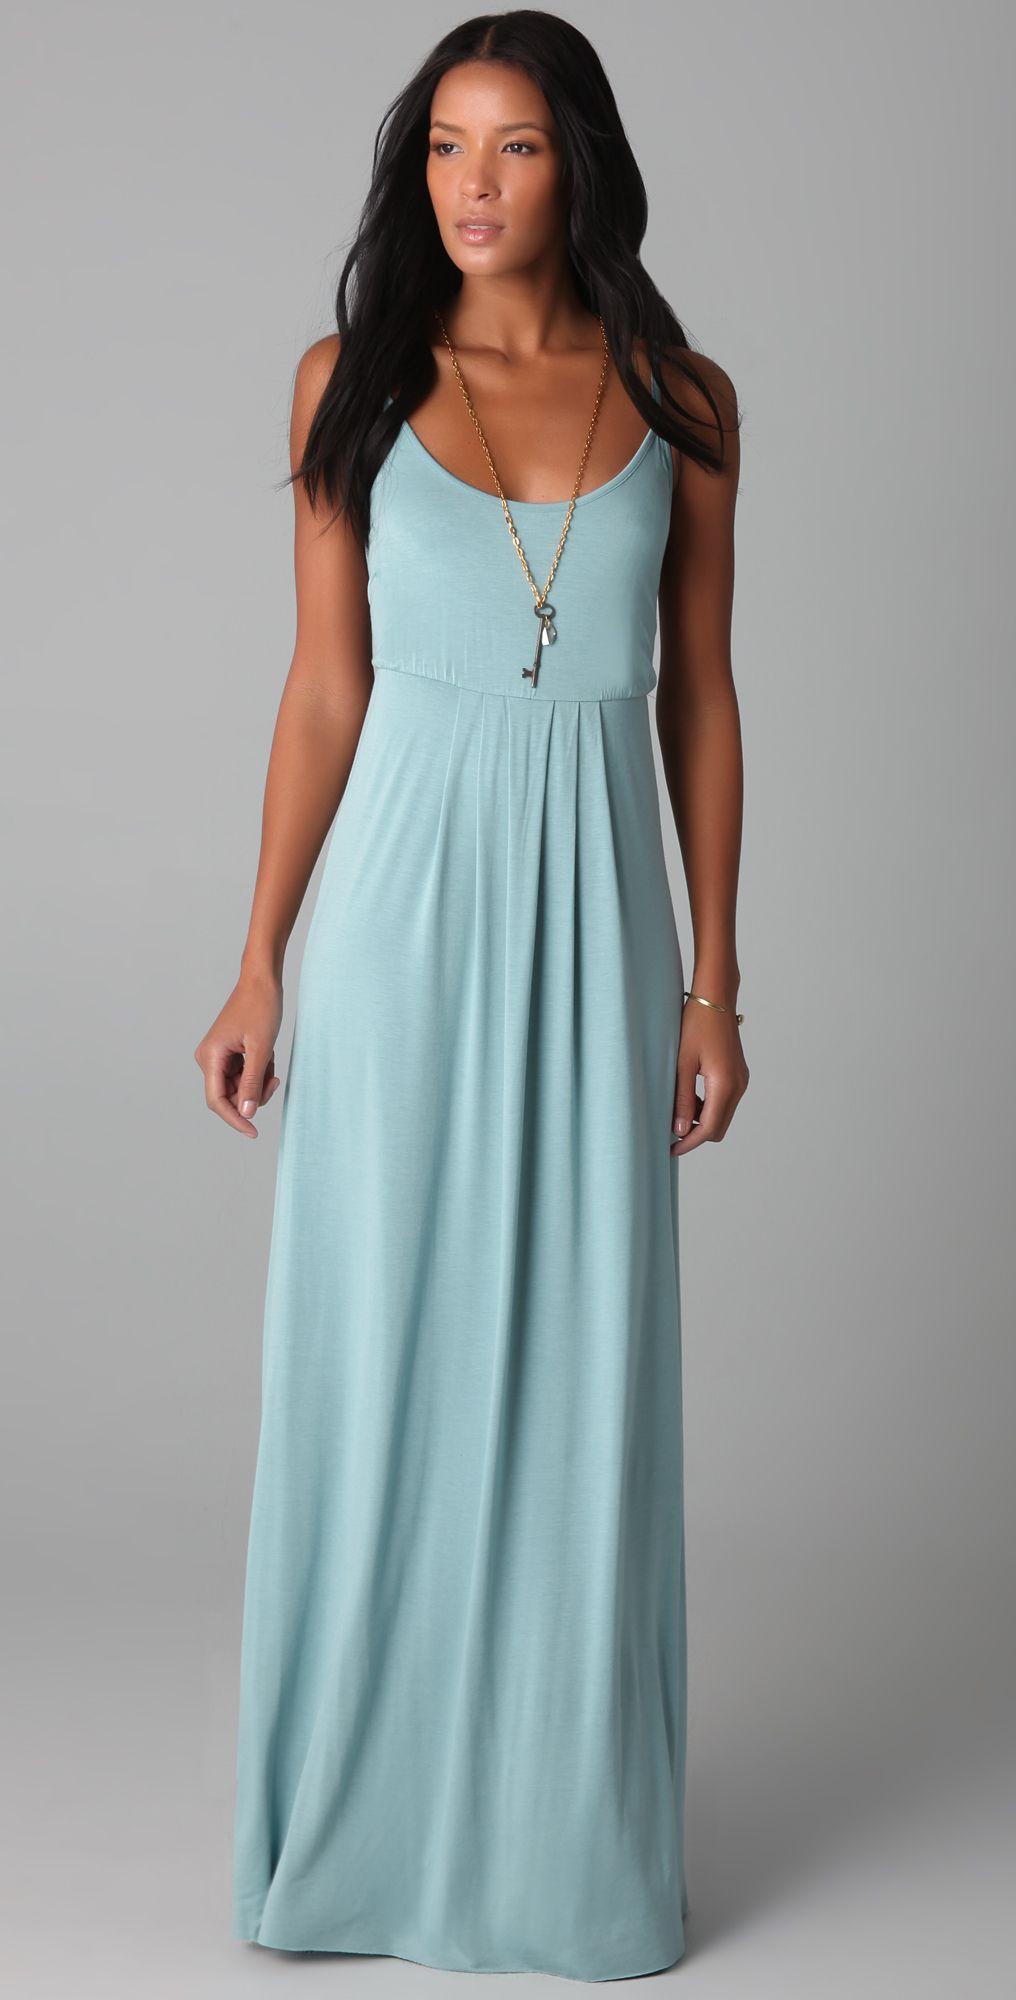 Rachel pally blanca dress dresses pinterest rachel pally and